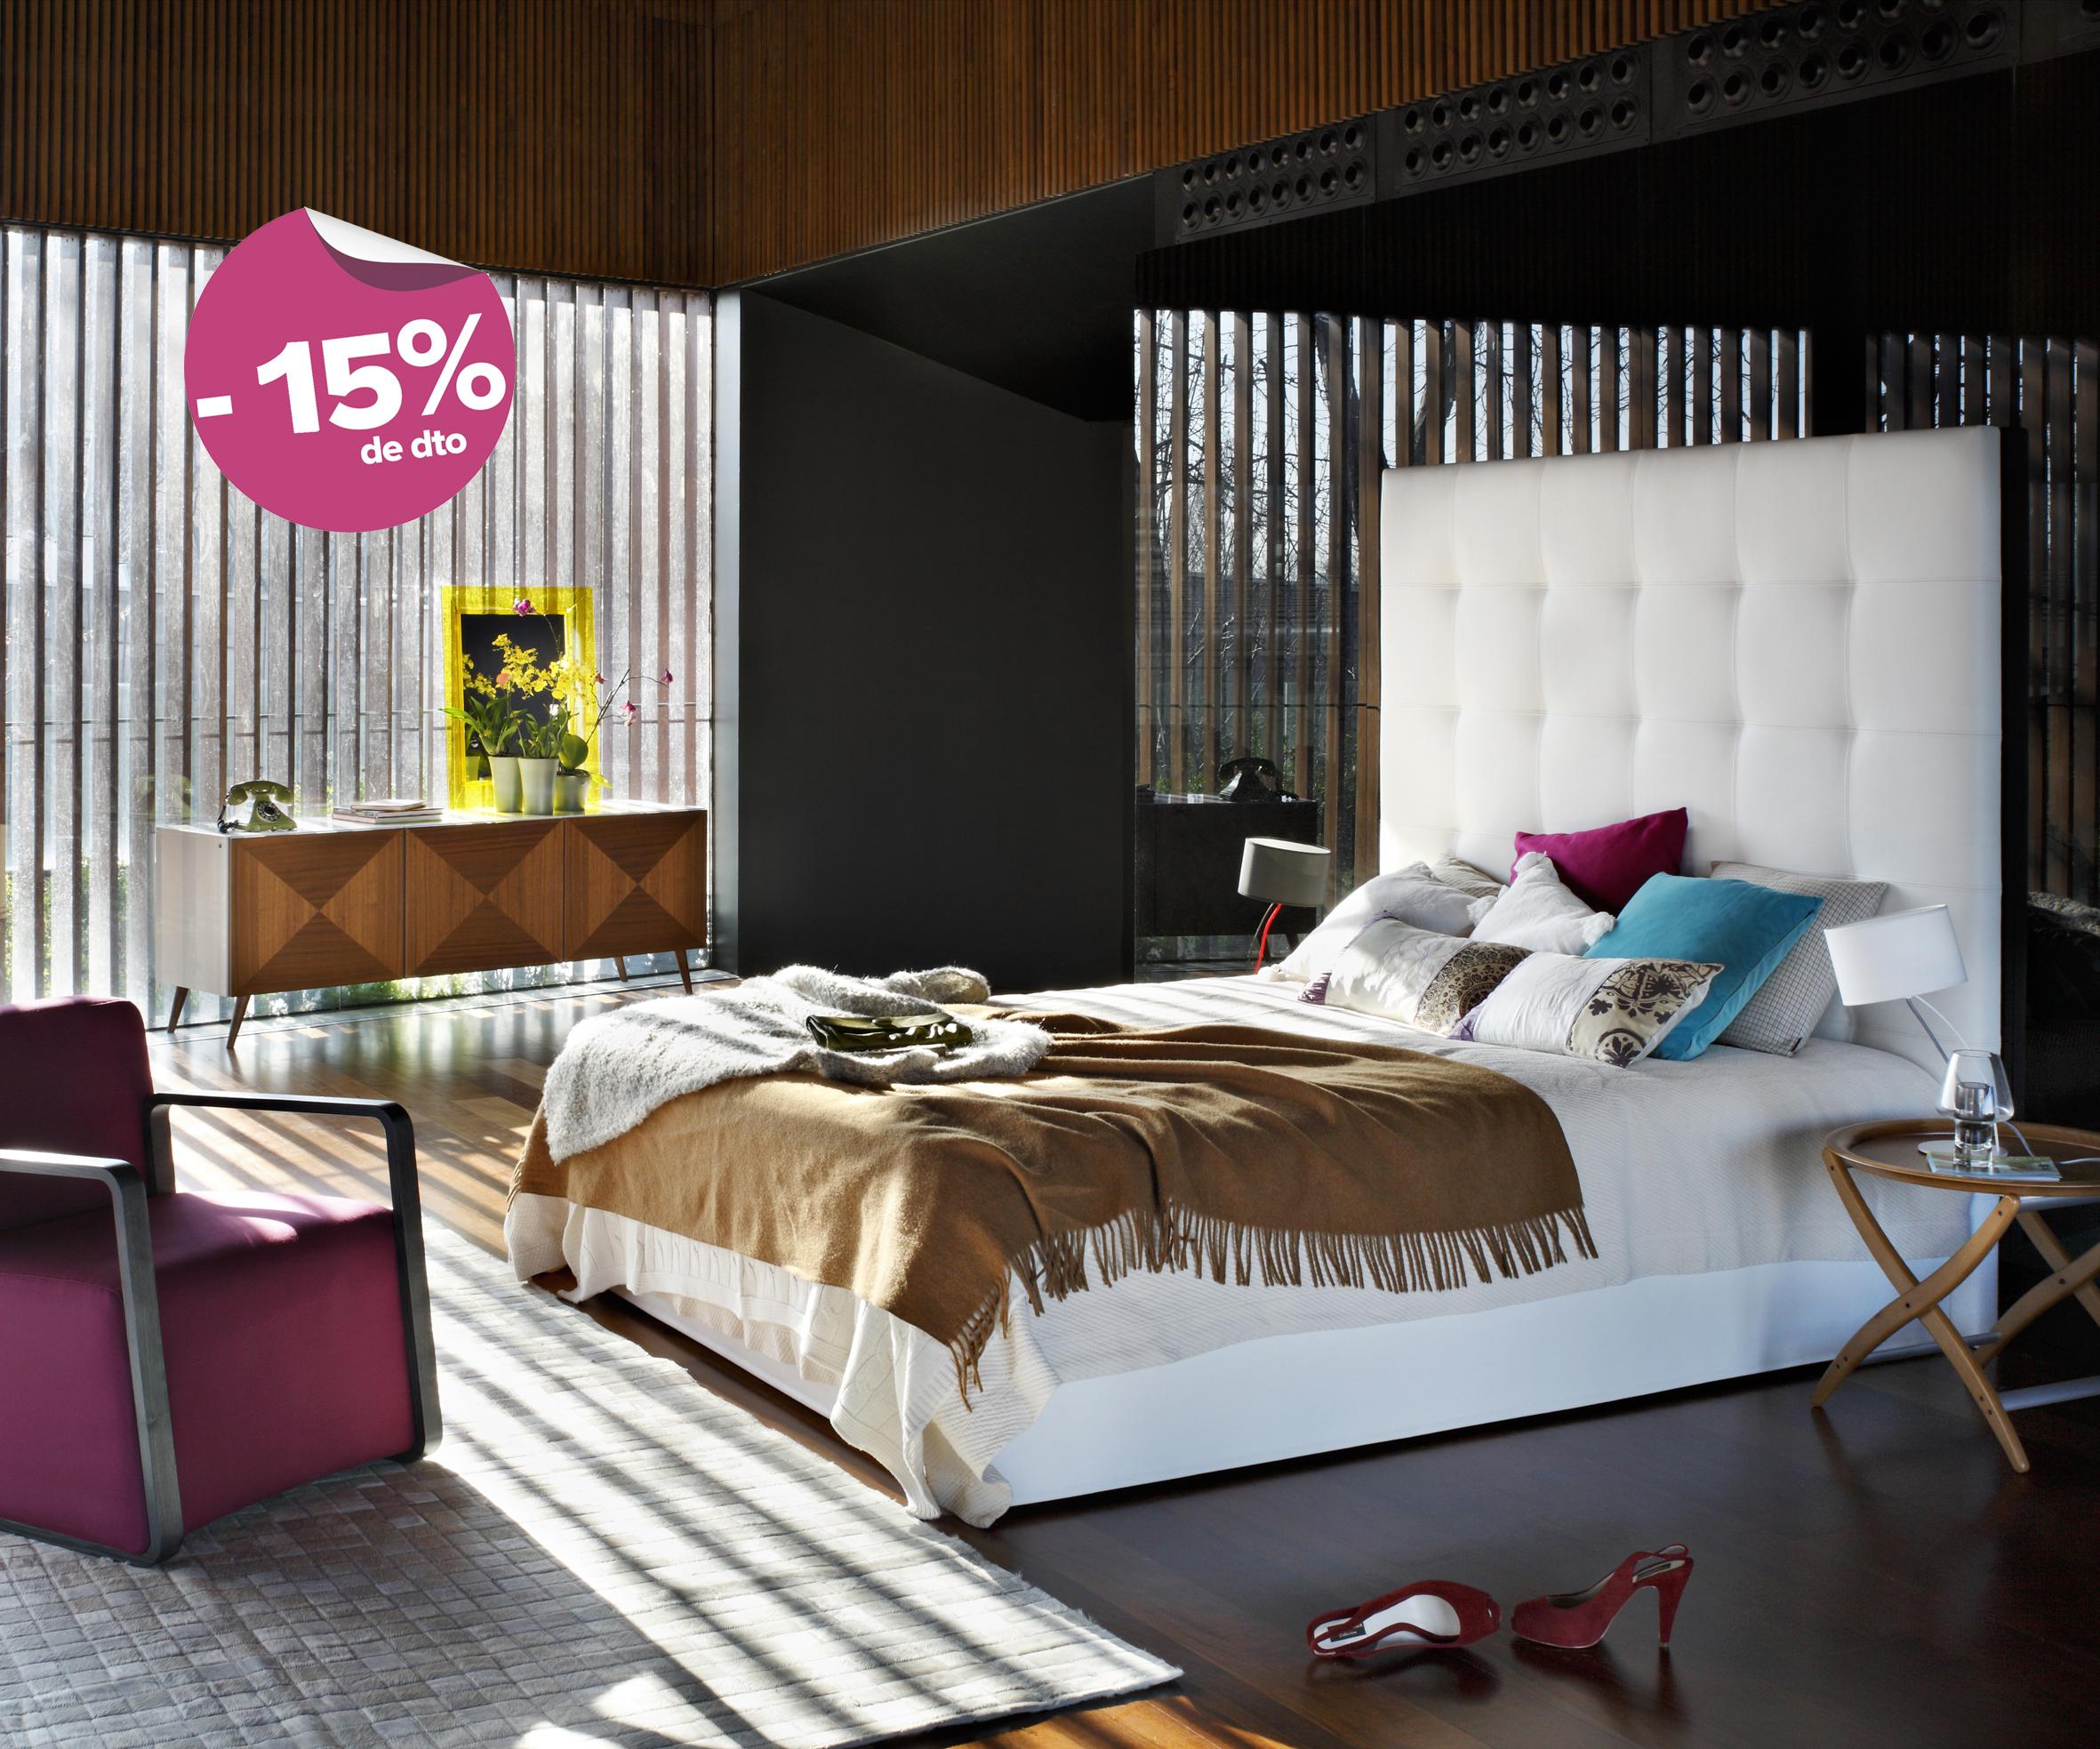 Dormitorios la oca es inspiraci n - La oca decoracion ...